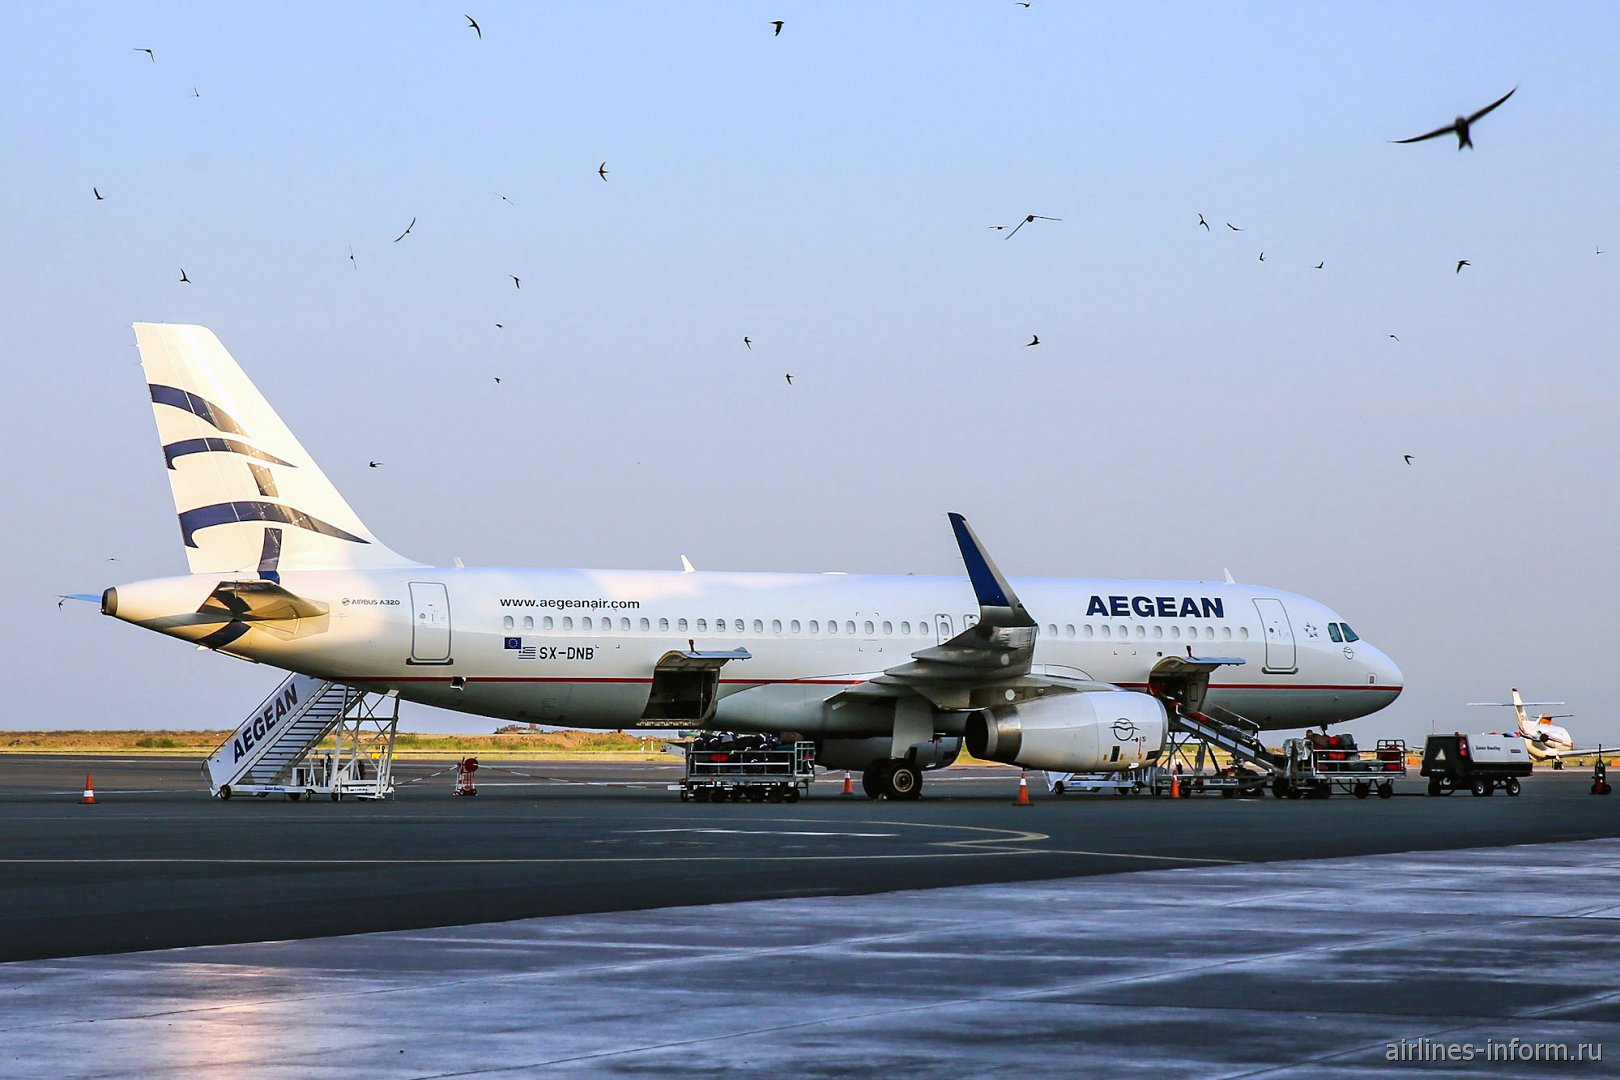 Самолет Airbus A320 авиакомпании Aegean Airlines в аэропорту Салоники